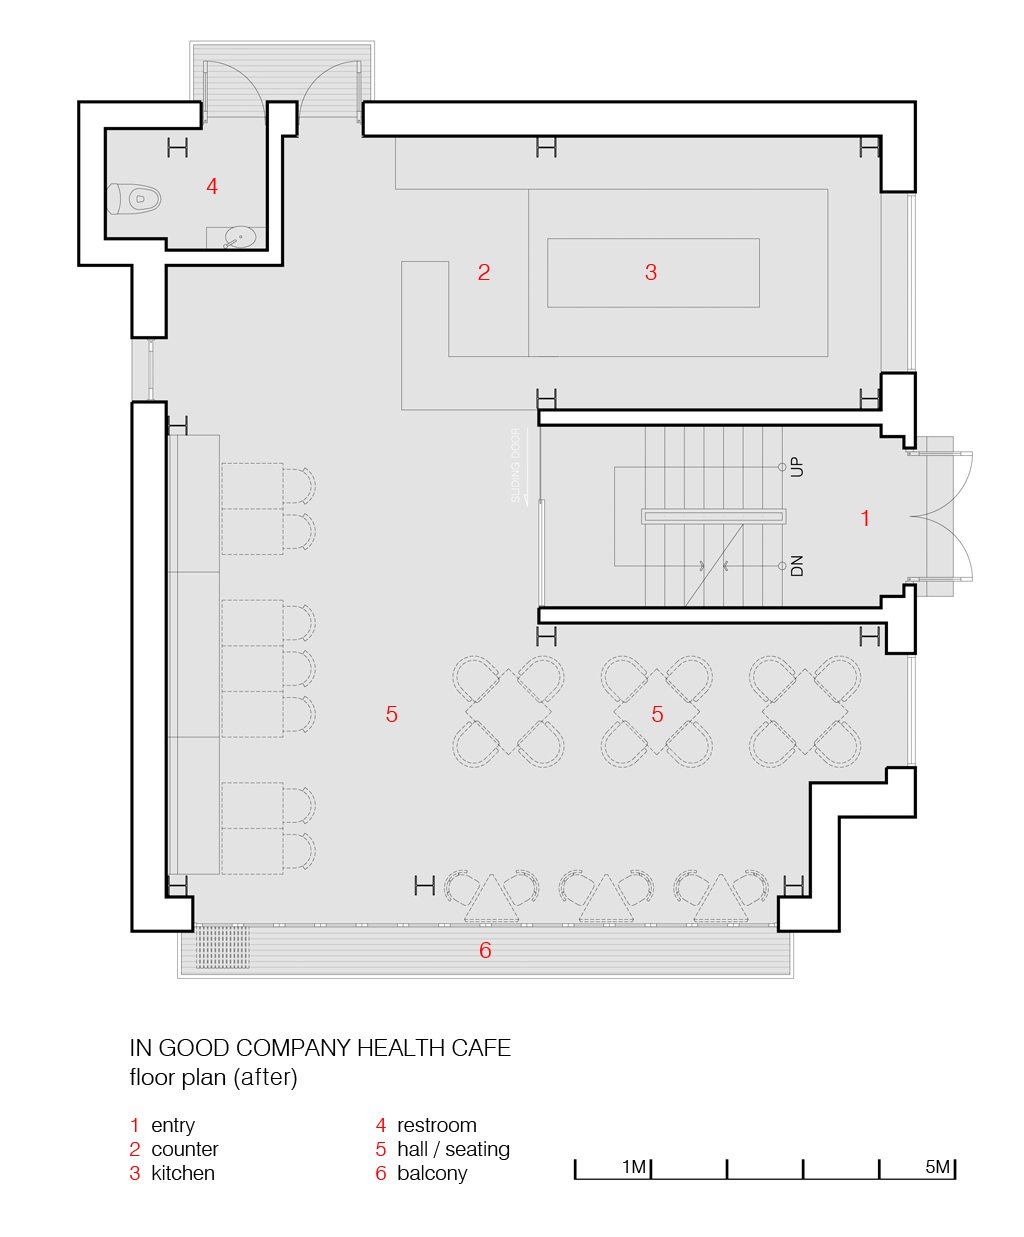 hjl studio - in good company floorplan